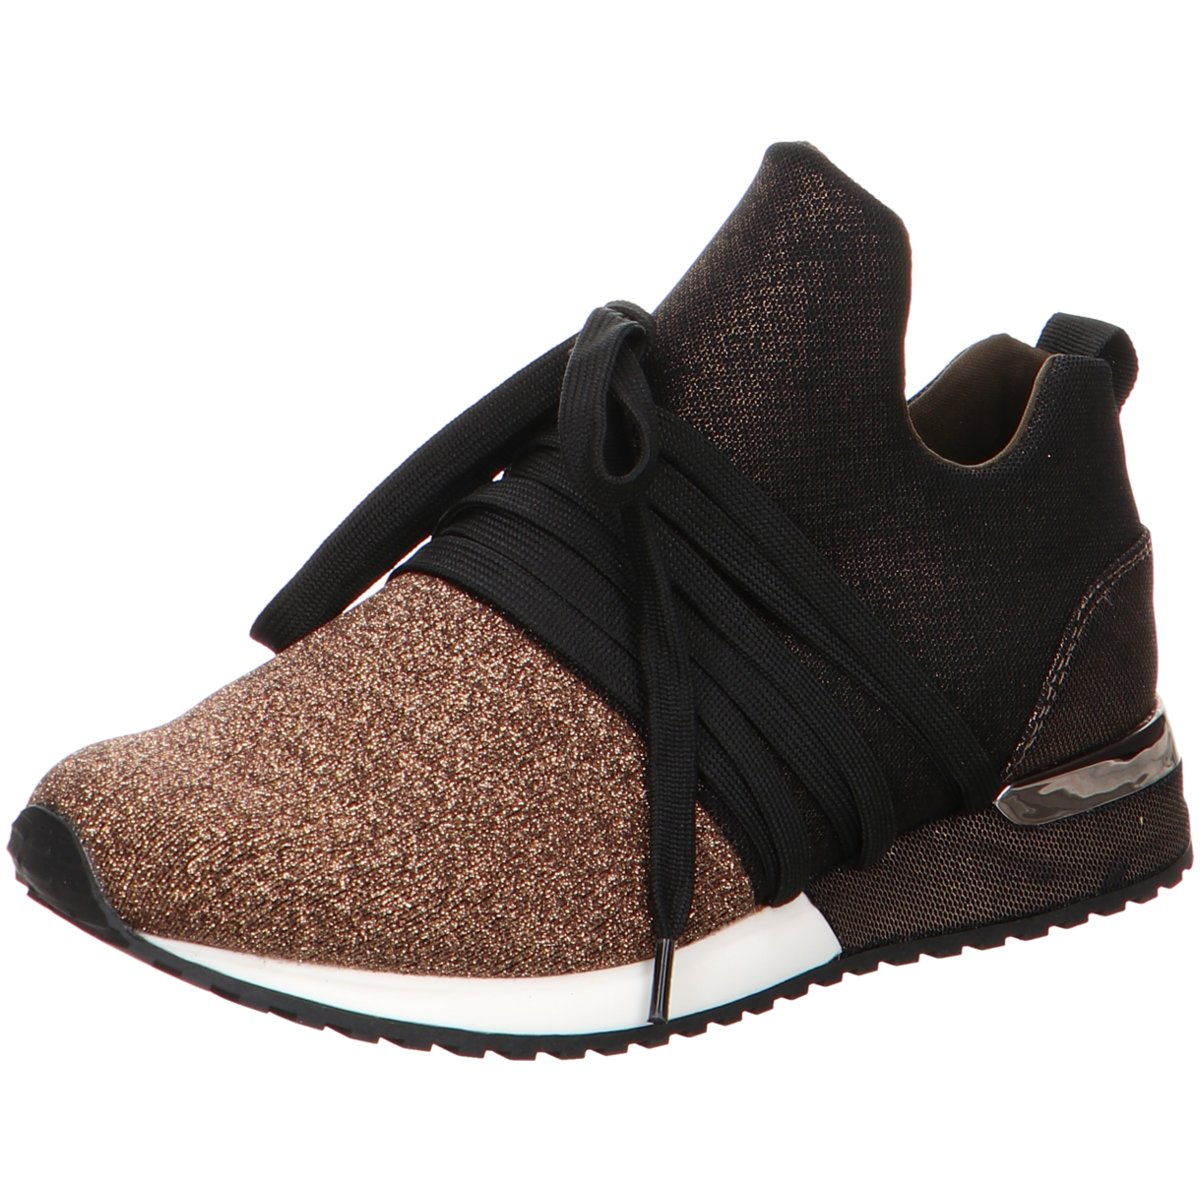 Details zu La Strada Damen Sneaker 546 1804189 4045 gold 588859